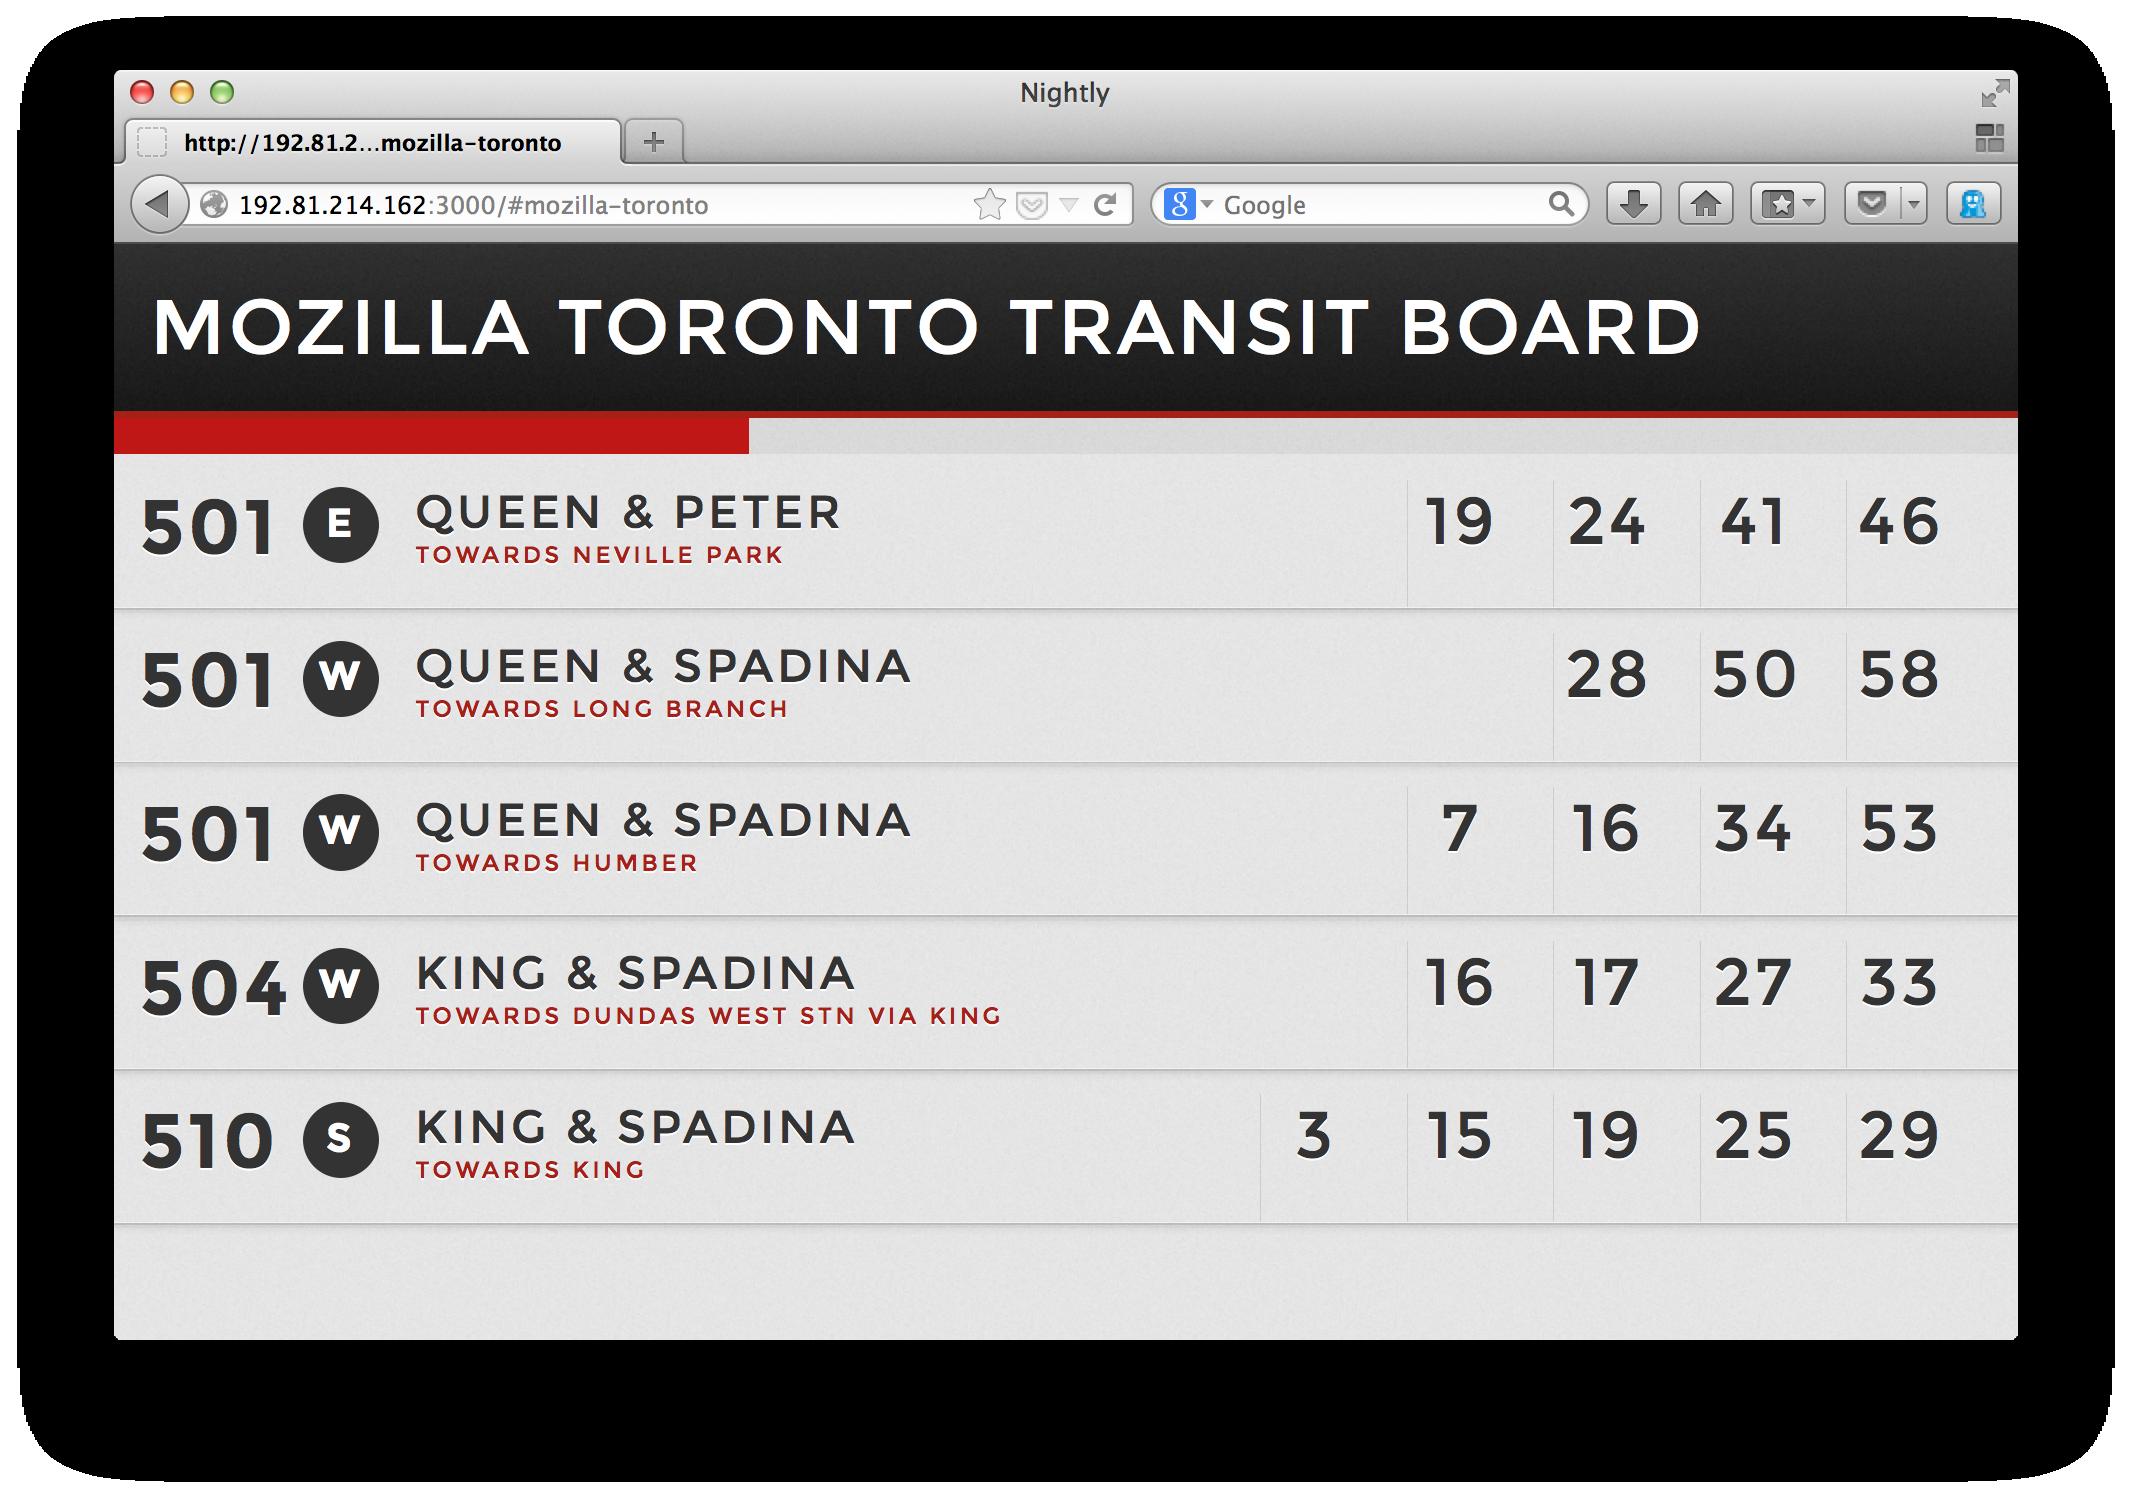 Mozilla Toronto Transit Board